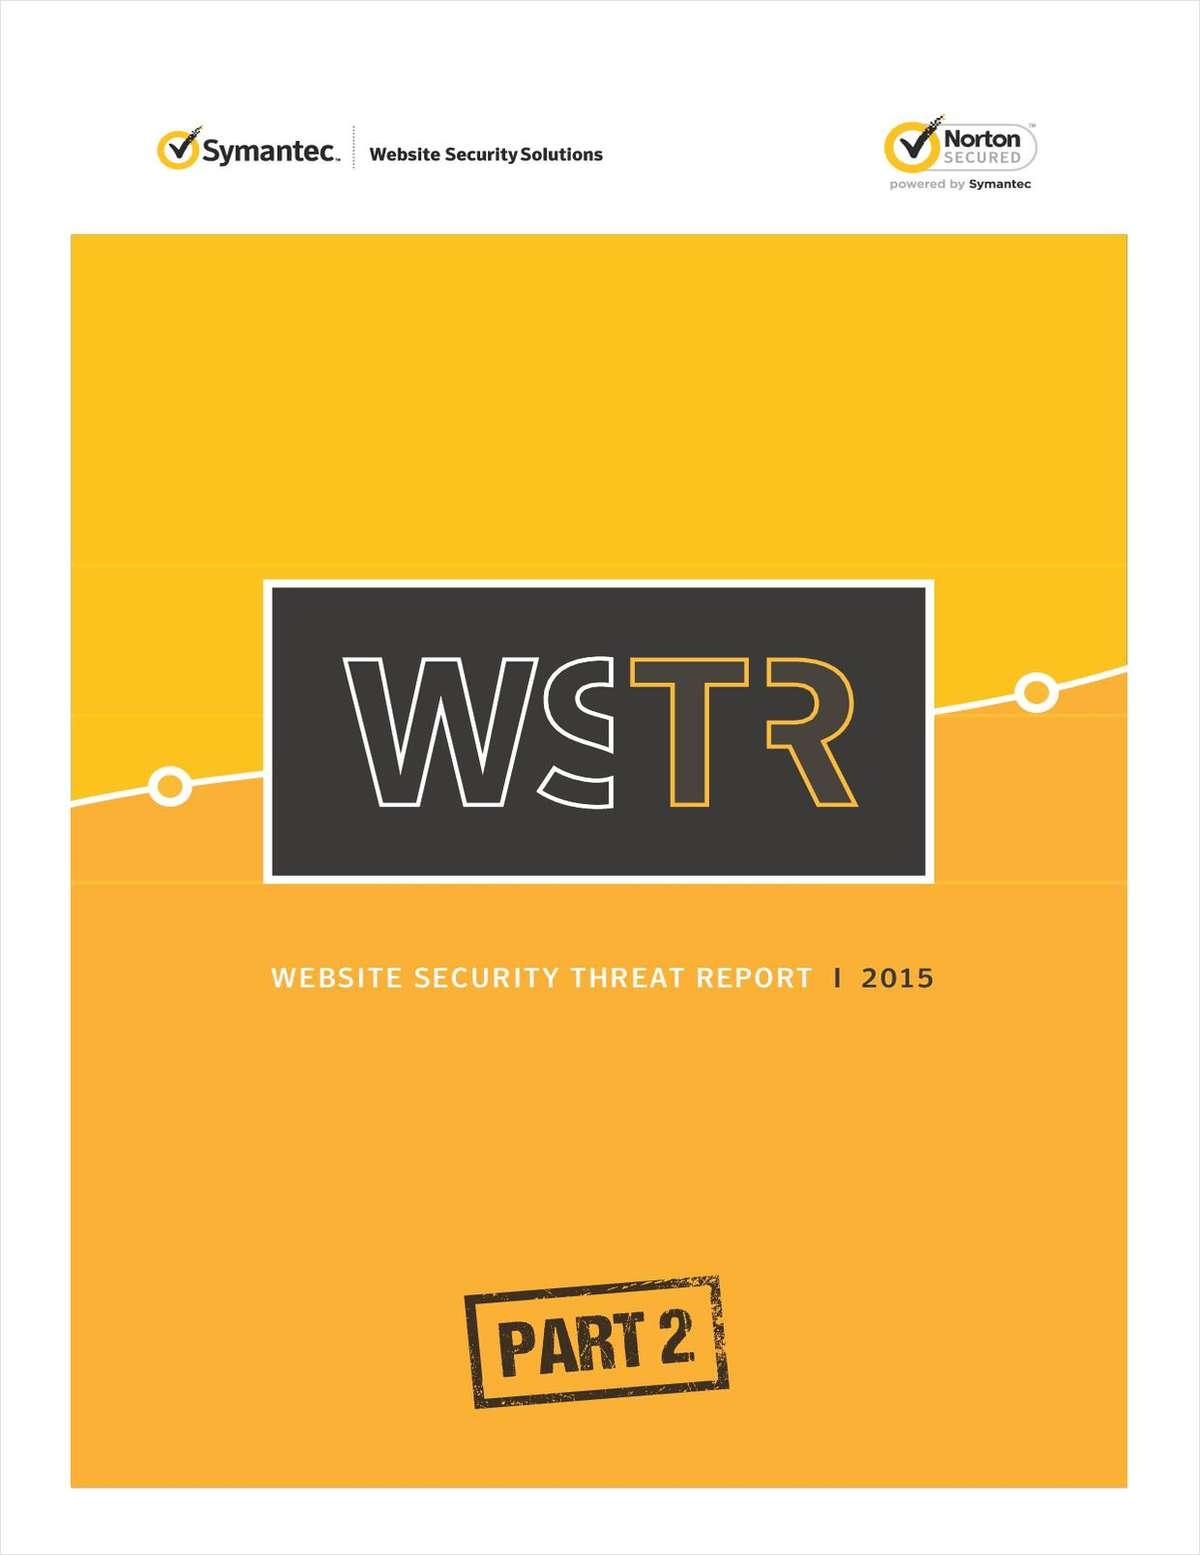 Website Security Threat Report 2015: Part 2